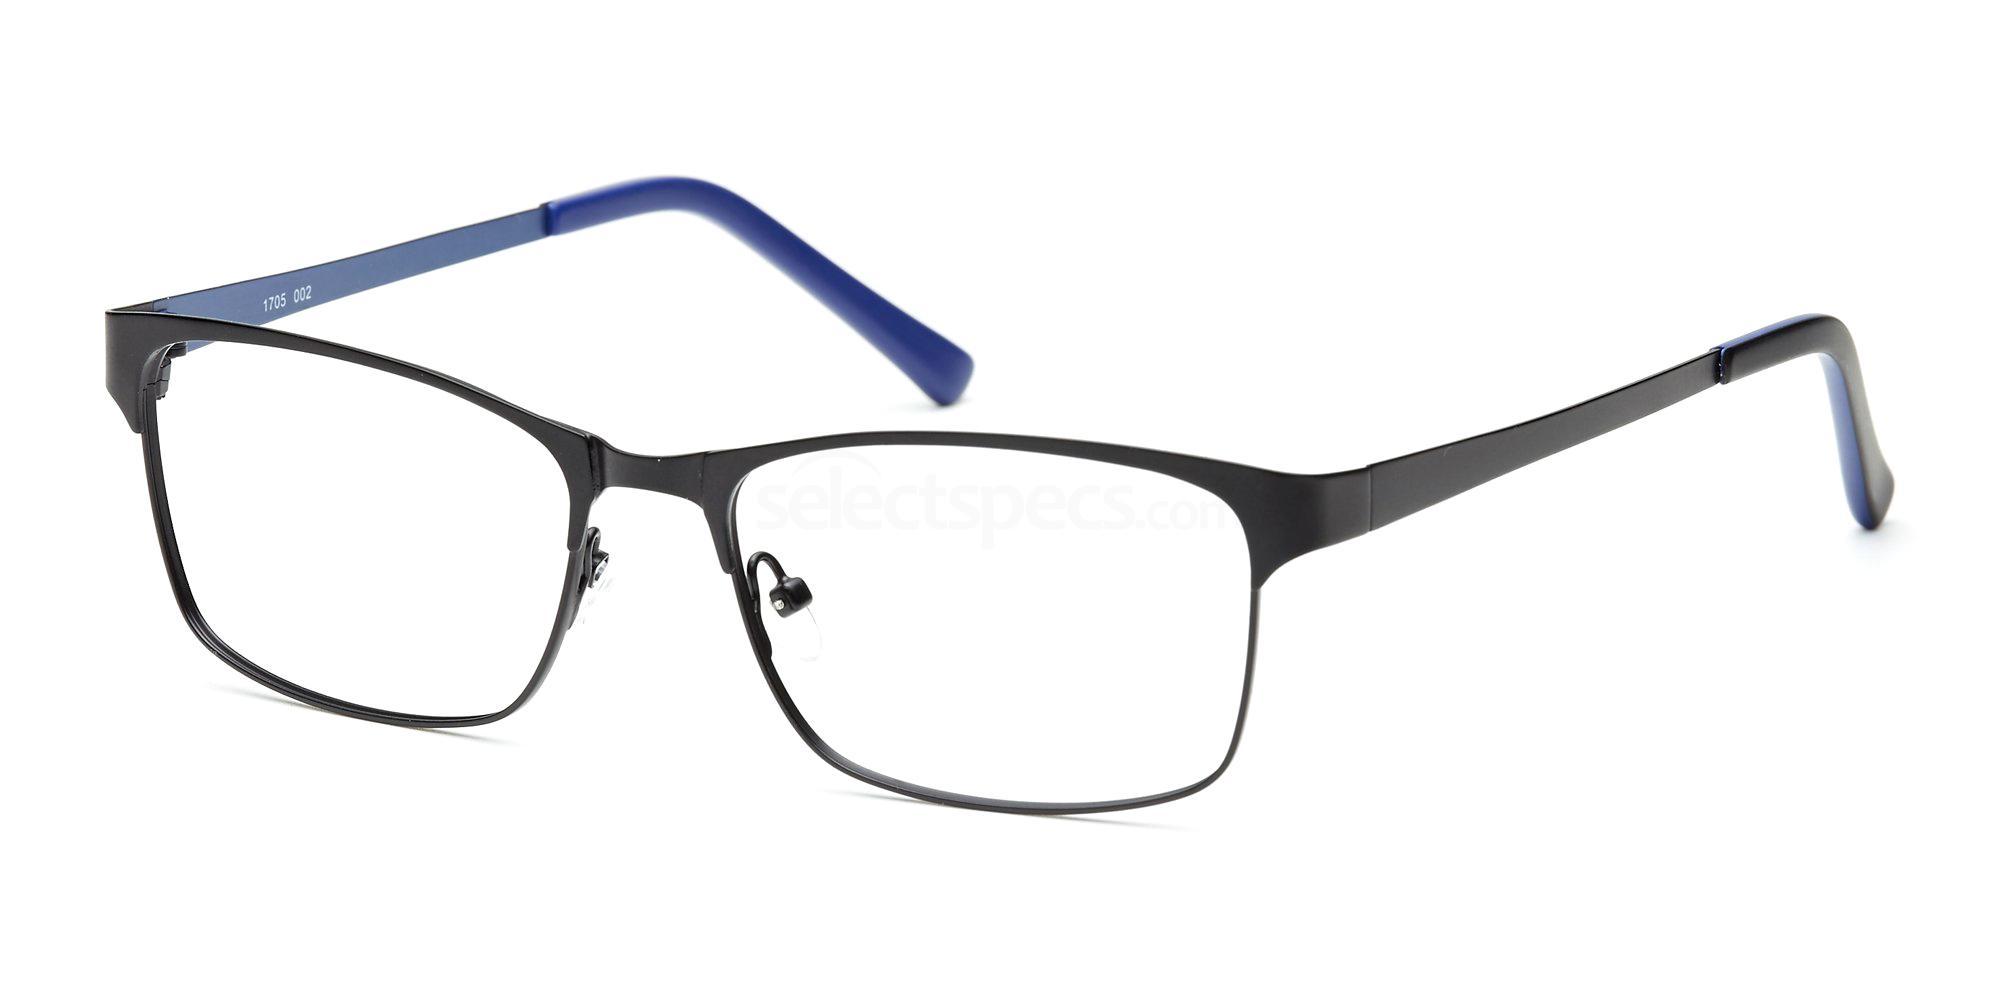 C1 FLX1705 Glasses, Flextra